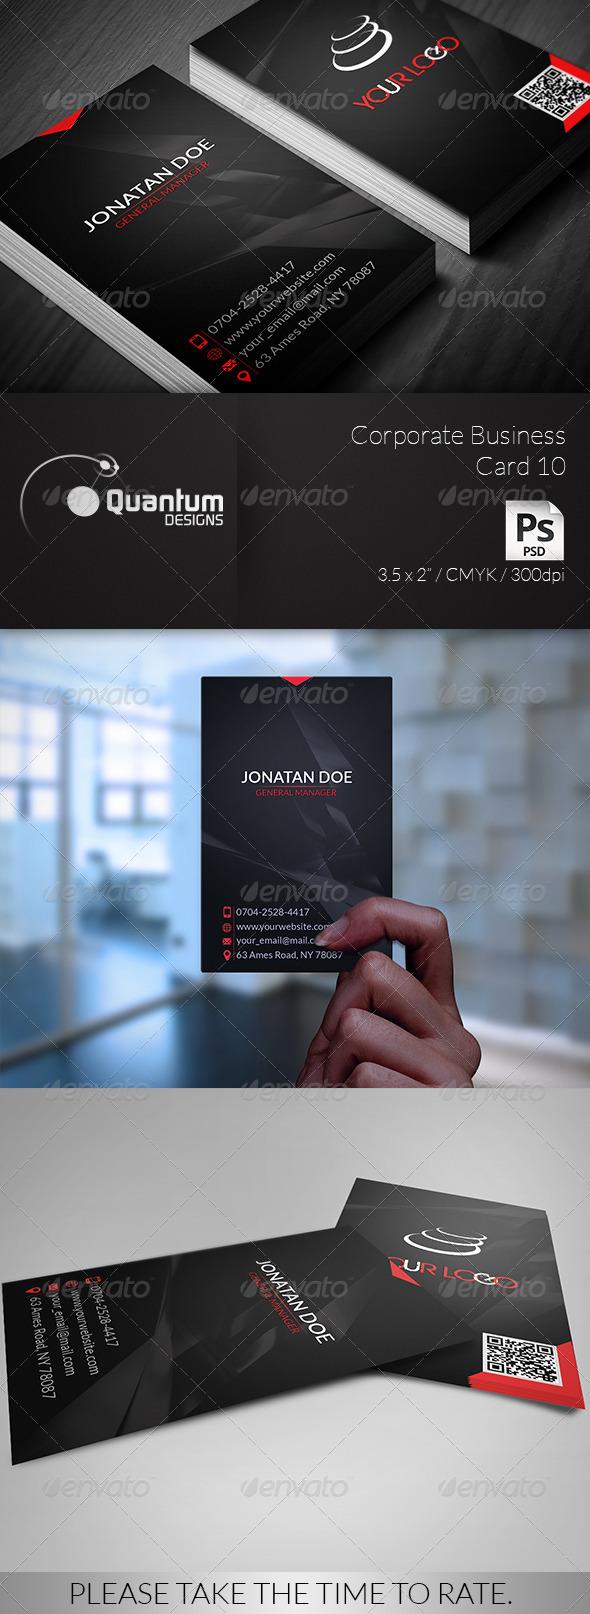 Corporate Business Card 10 - Corporate Business Cards